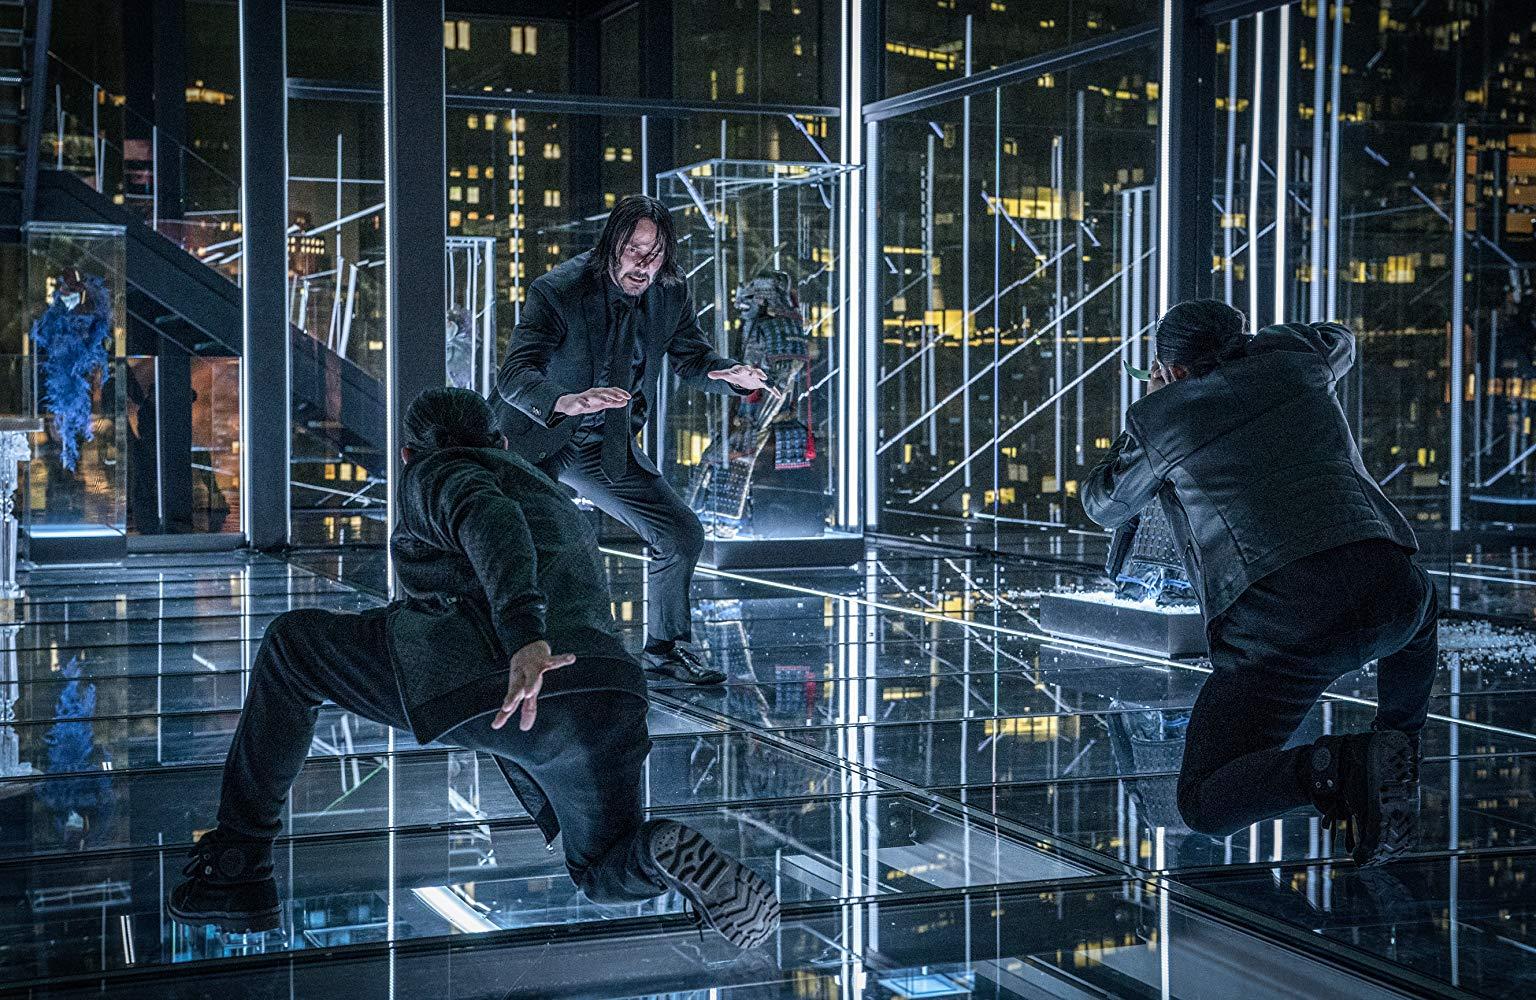 Keanu Reeves en una escena de John Wick 3 - Parabellum (2019).jpg